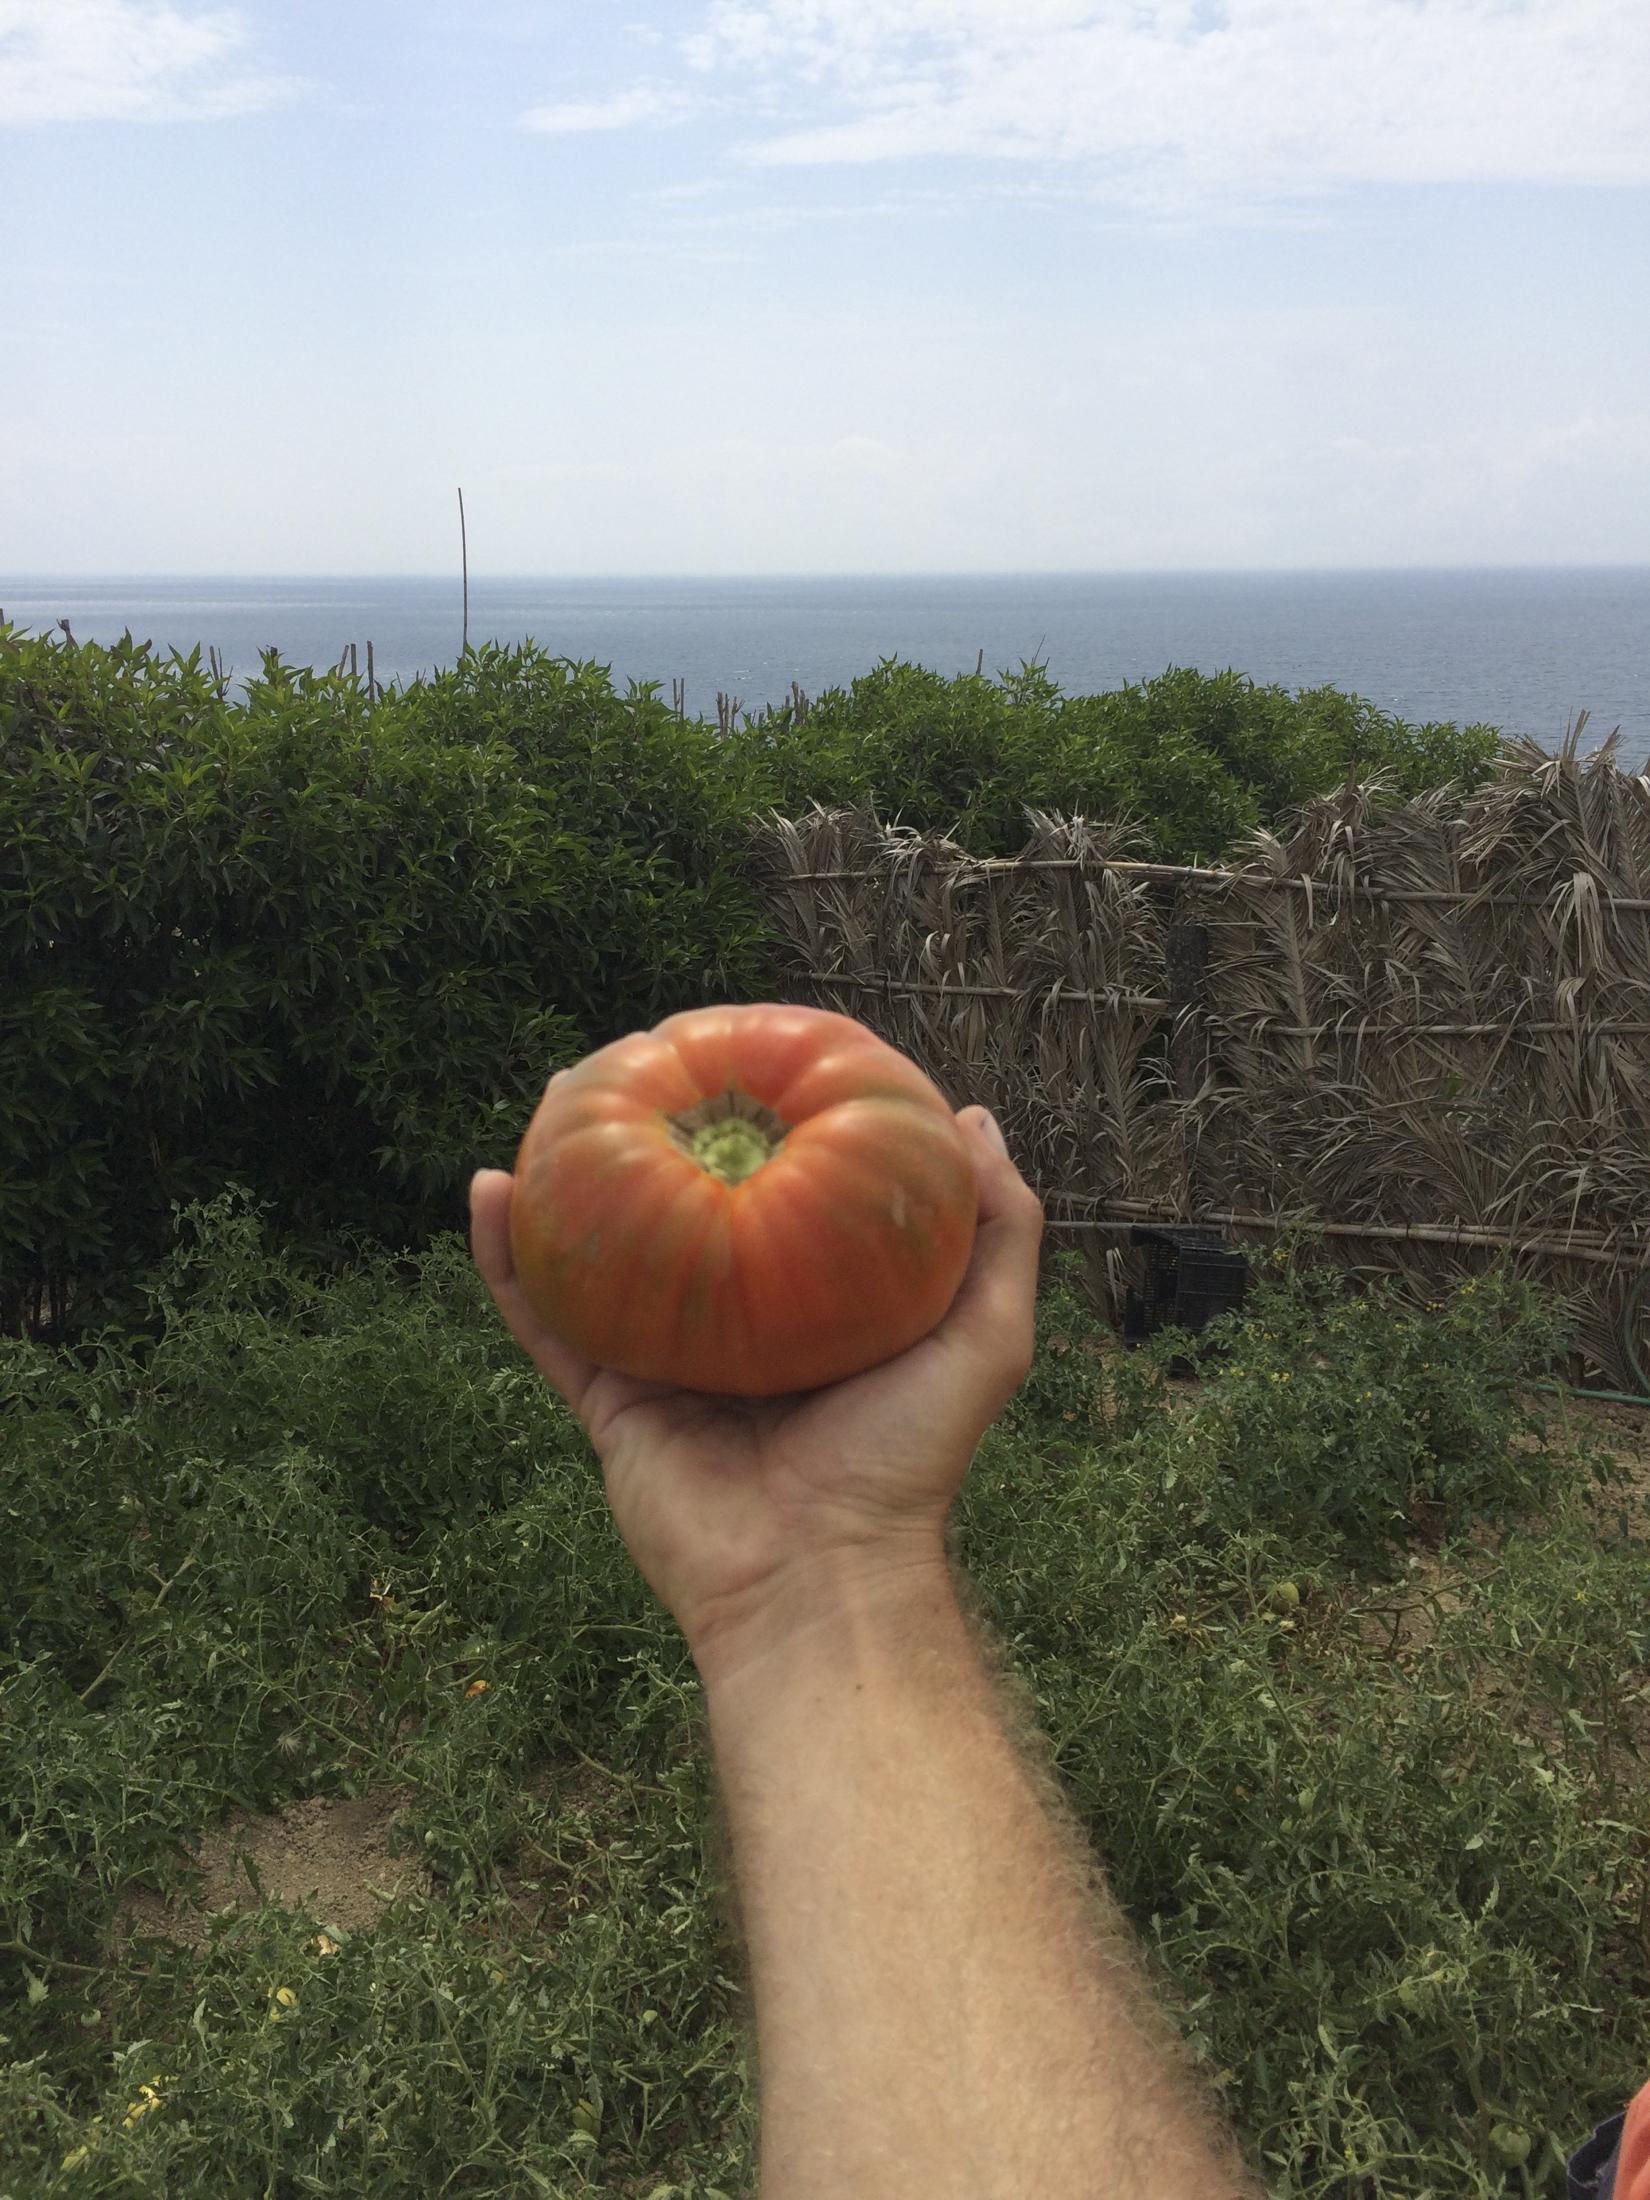 A real tomatoe